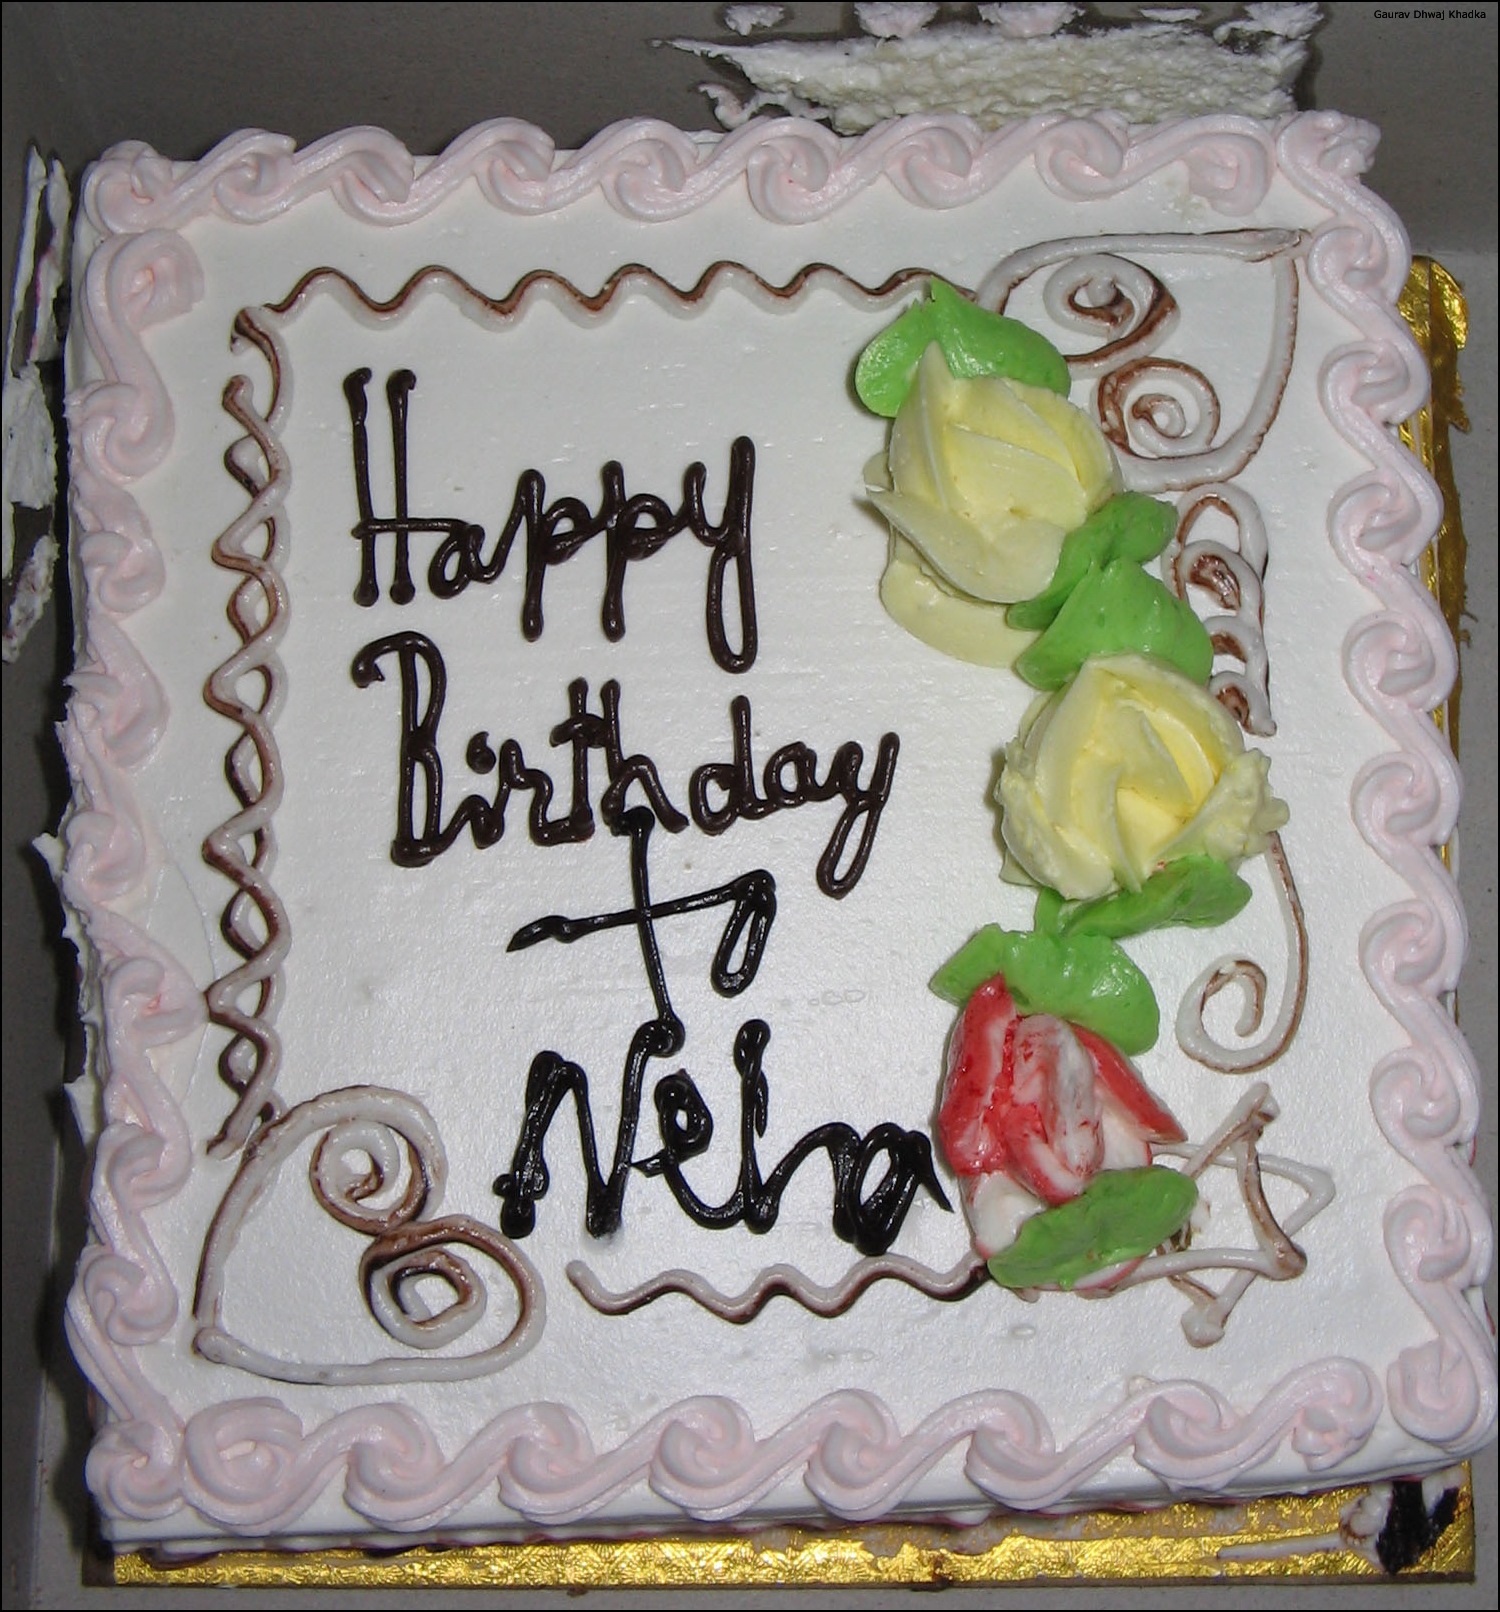 Birthday Cake Image For Neha :  Happy Birthday Neha(neha-rockks) (Page 4) 3805697 ...